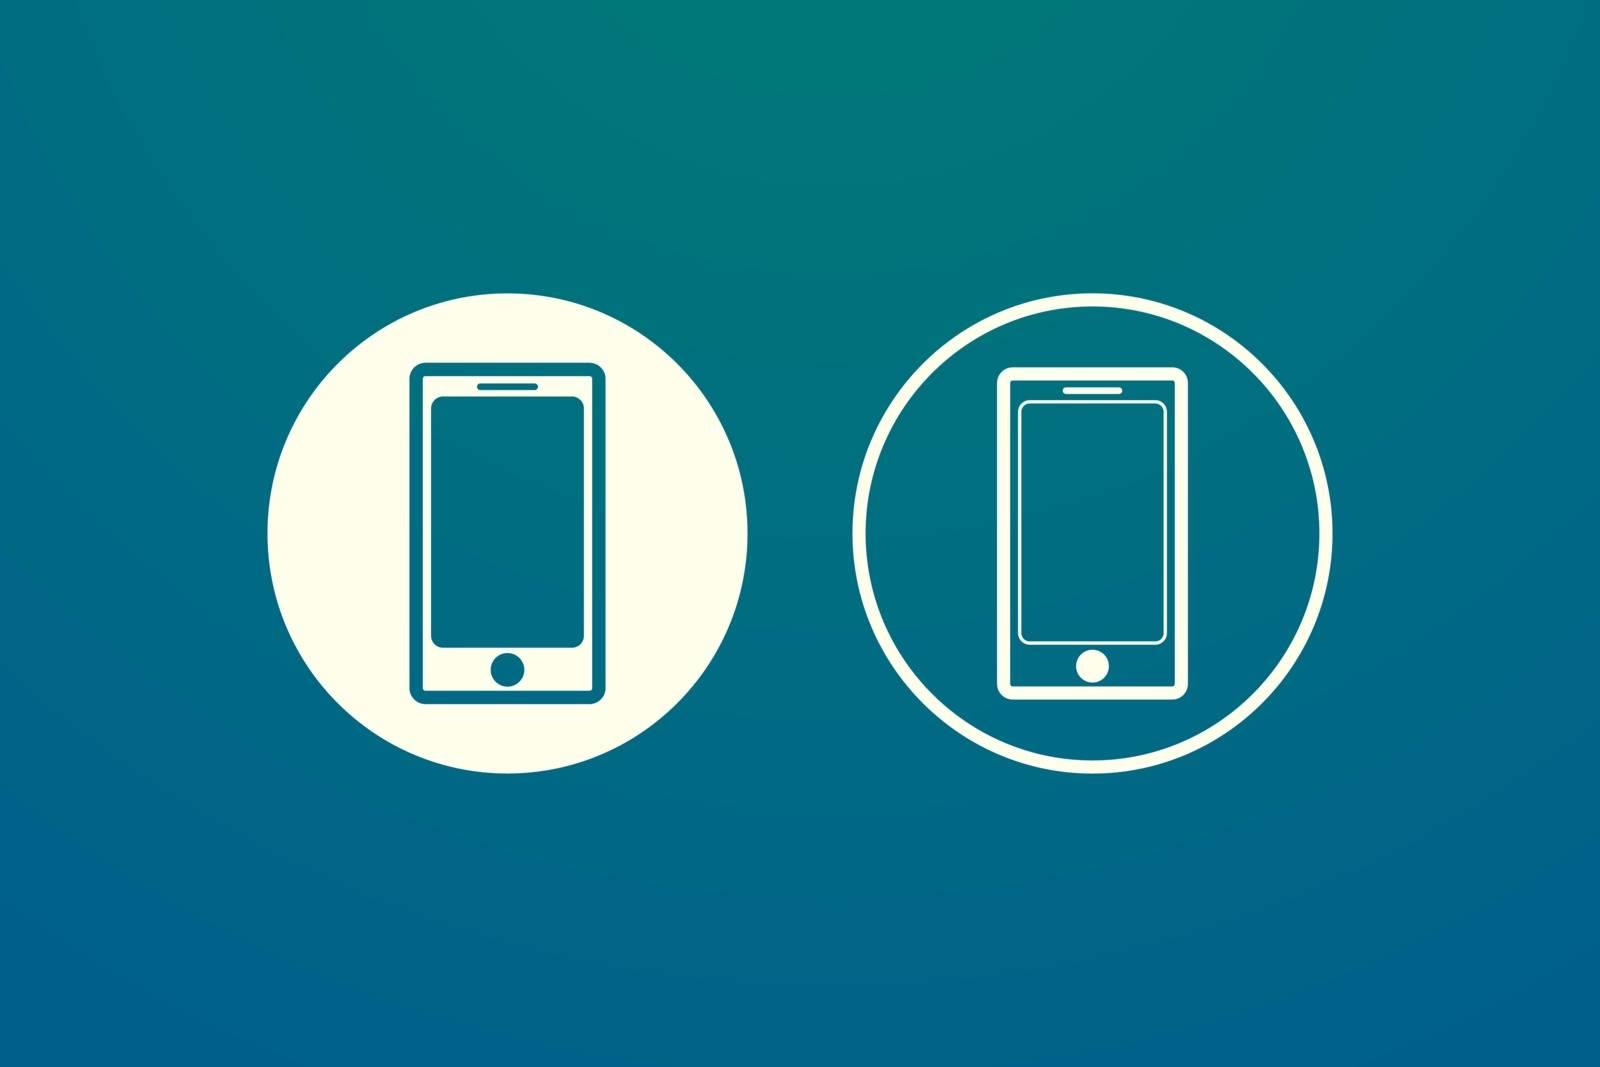 Mobile phone. Smartphone icon. Call icon